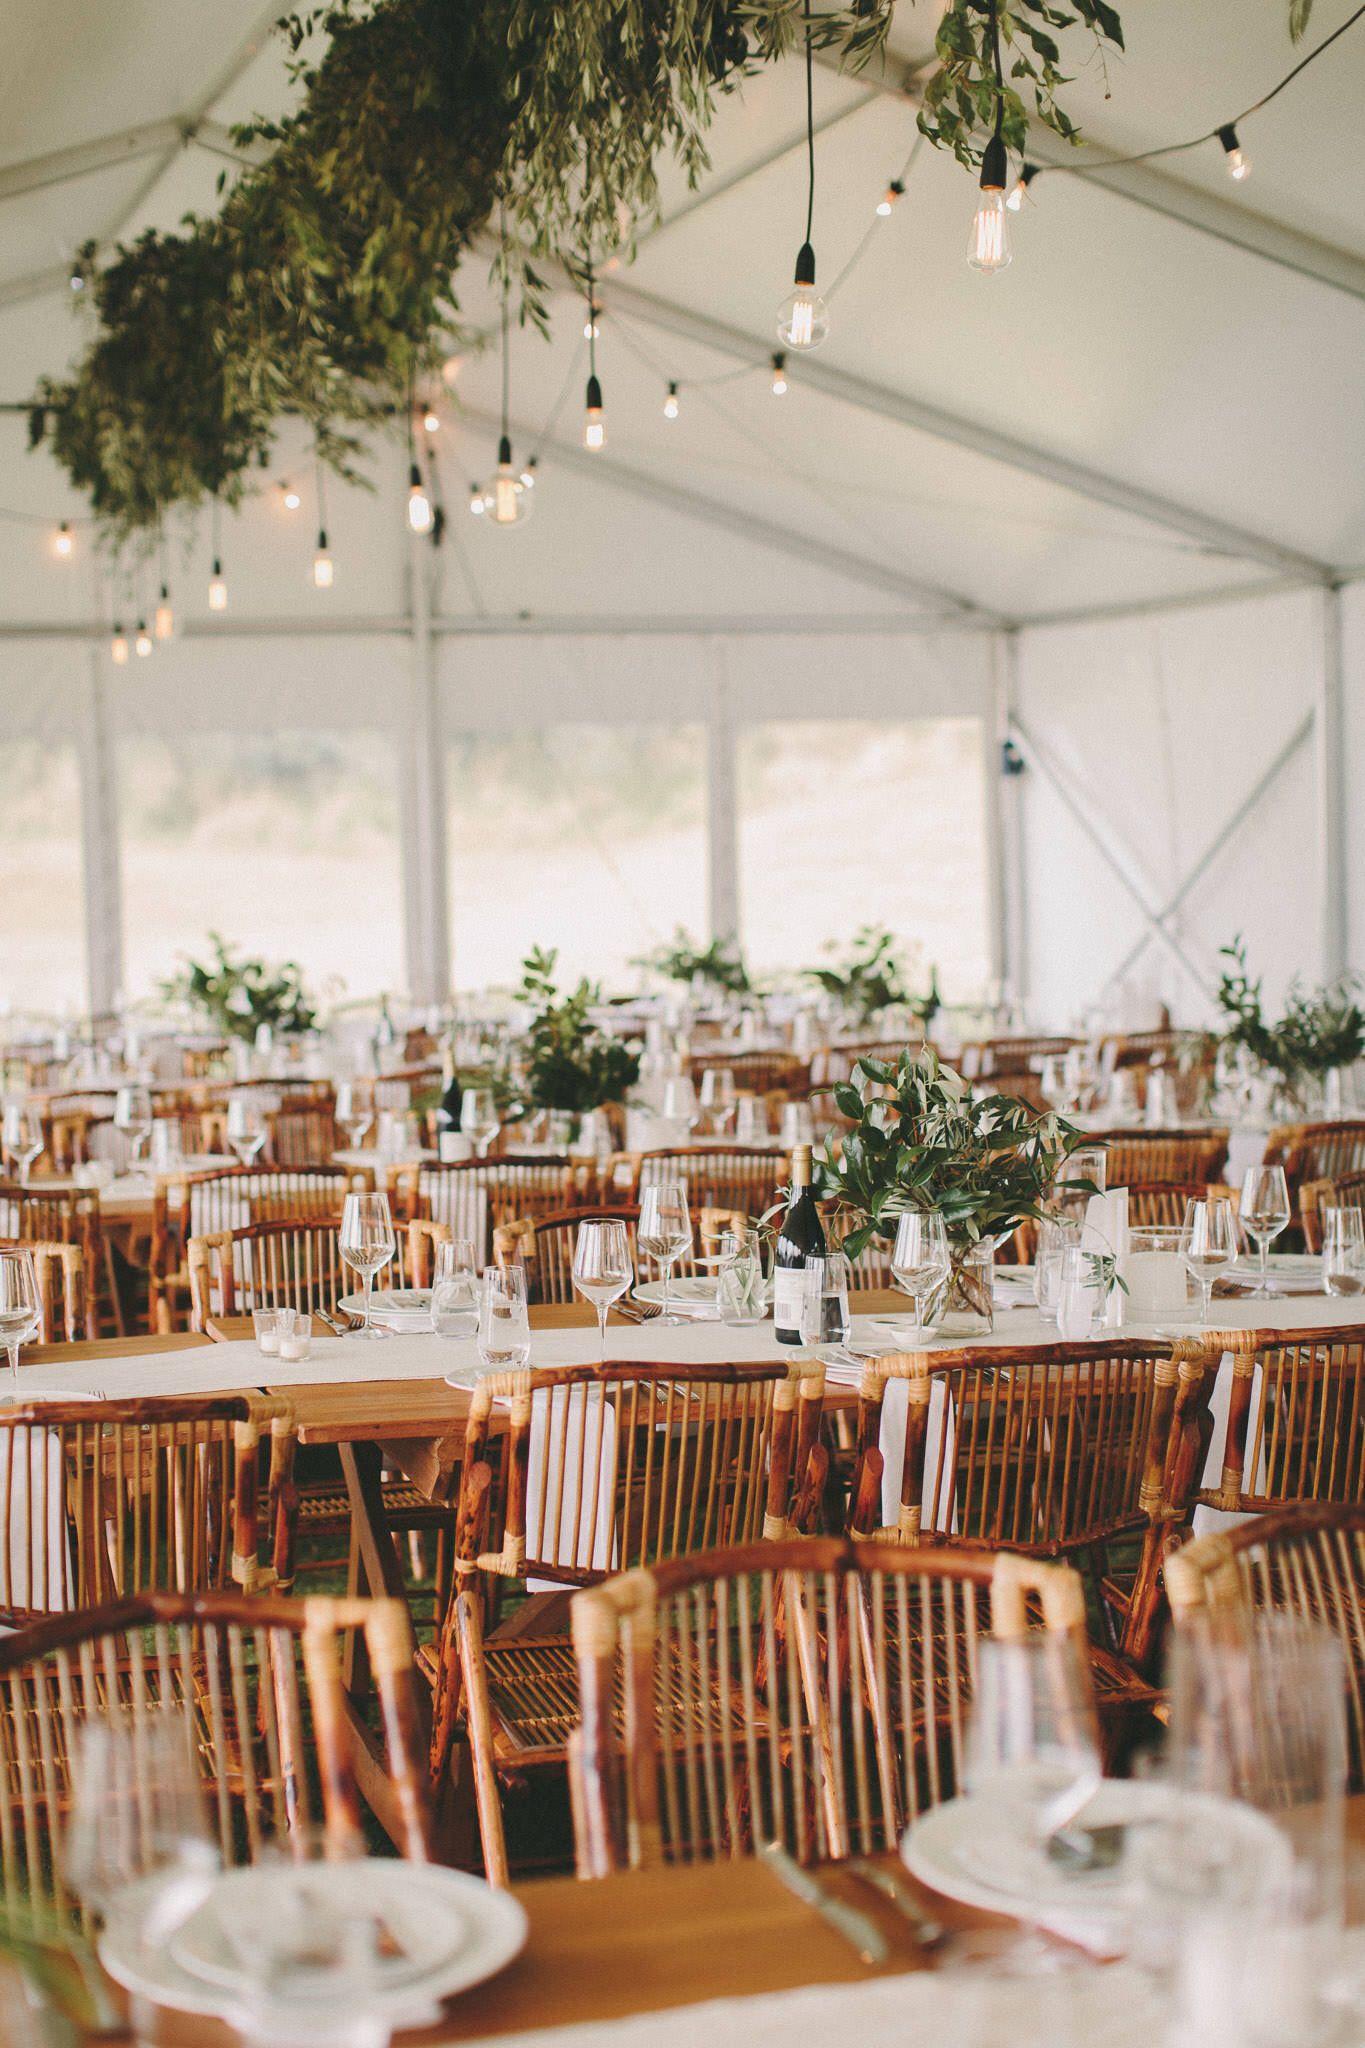 Waiheke Marquee Wedding Bamboo Chairs Wooden Table Fresh Green And White Wedding Photo Wedding Reception Chairs Bamboo Chair Marquee Wedding Receptions